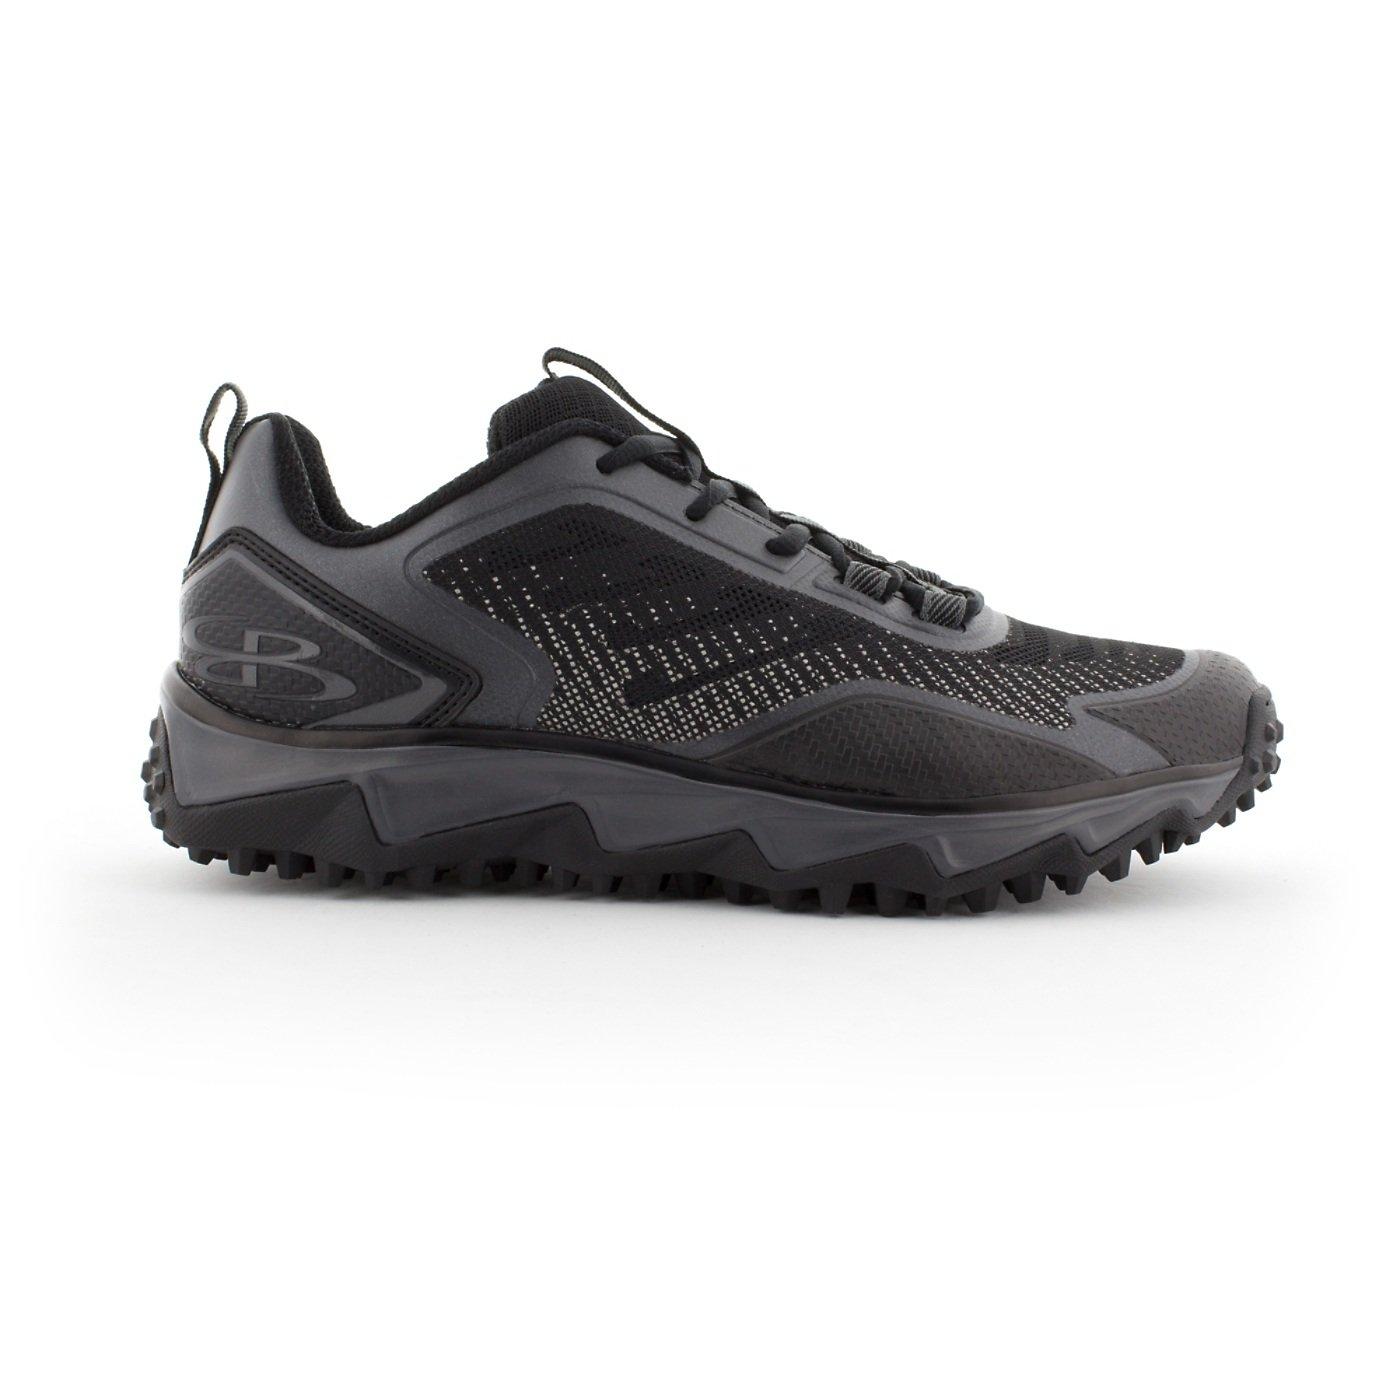 BoombahメンズBerzerk Turf Shoes – 13色オプション – 複数のサイズ B076B3LB9Z 11|ブラック/チャーコール ブラック/チャーコール 11